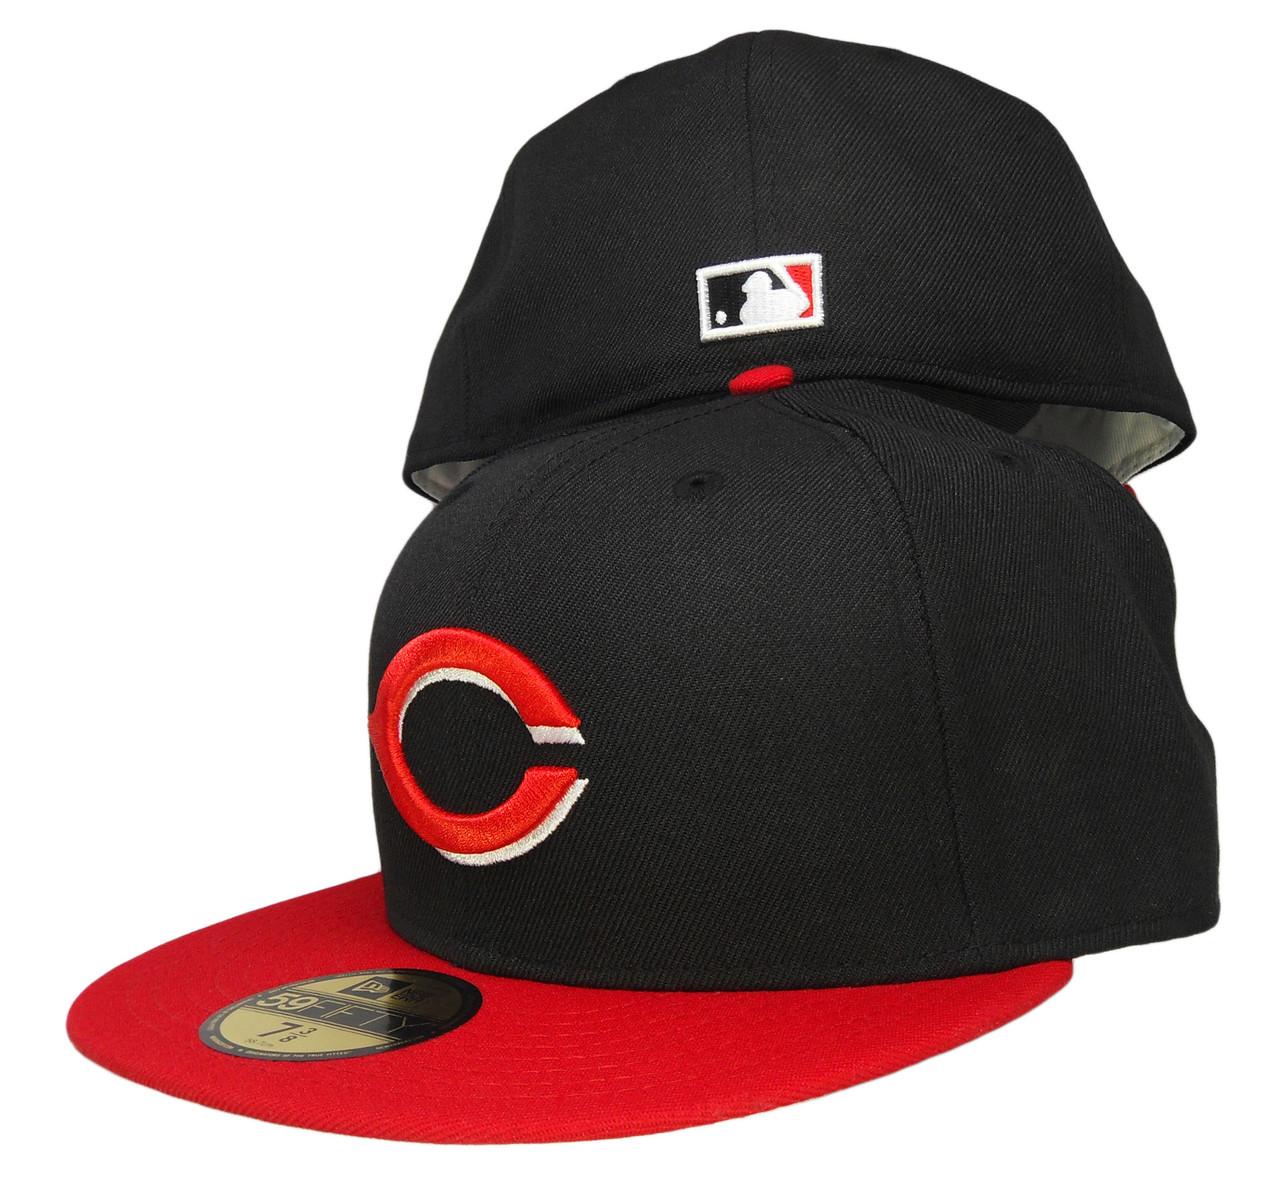 769b851b598a6a Cincinnati Reds New Era Gray bottom 59Fifty Fitted Hat - Black, Red -  ECapsUnlimited.com